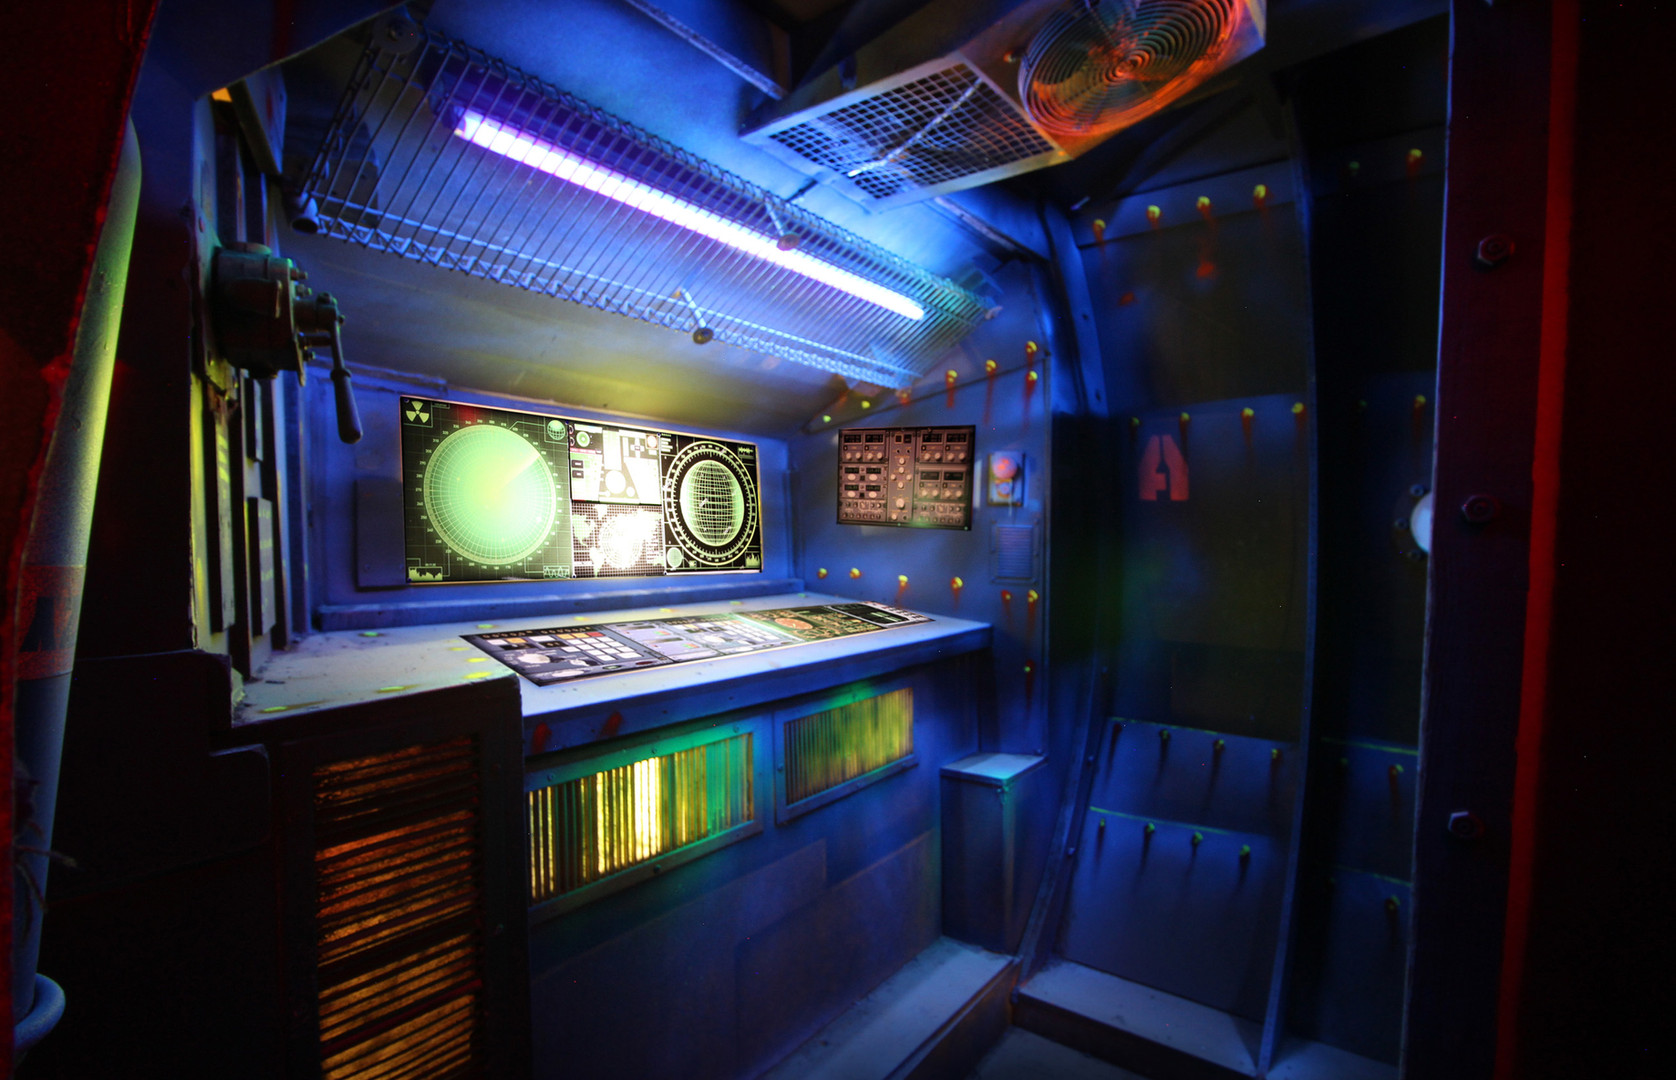 sous-marin - 19 (1) copie.jpg